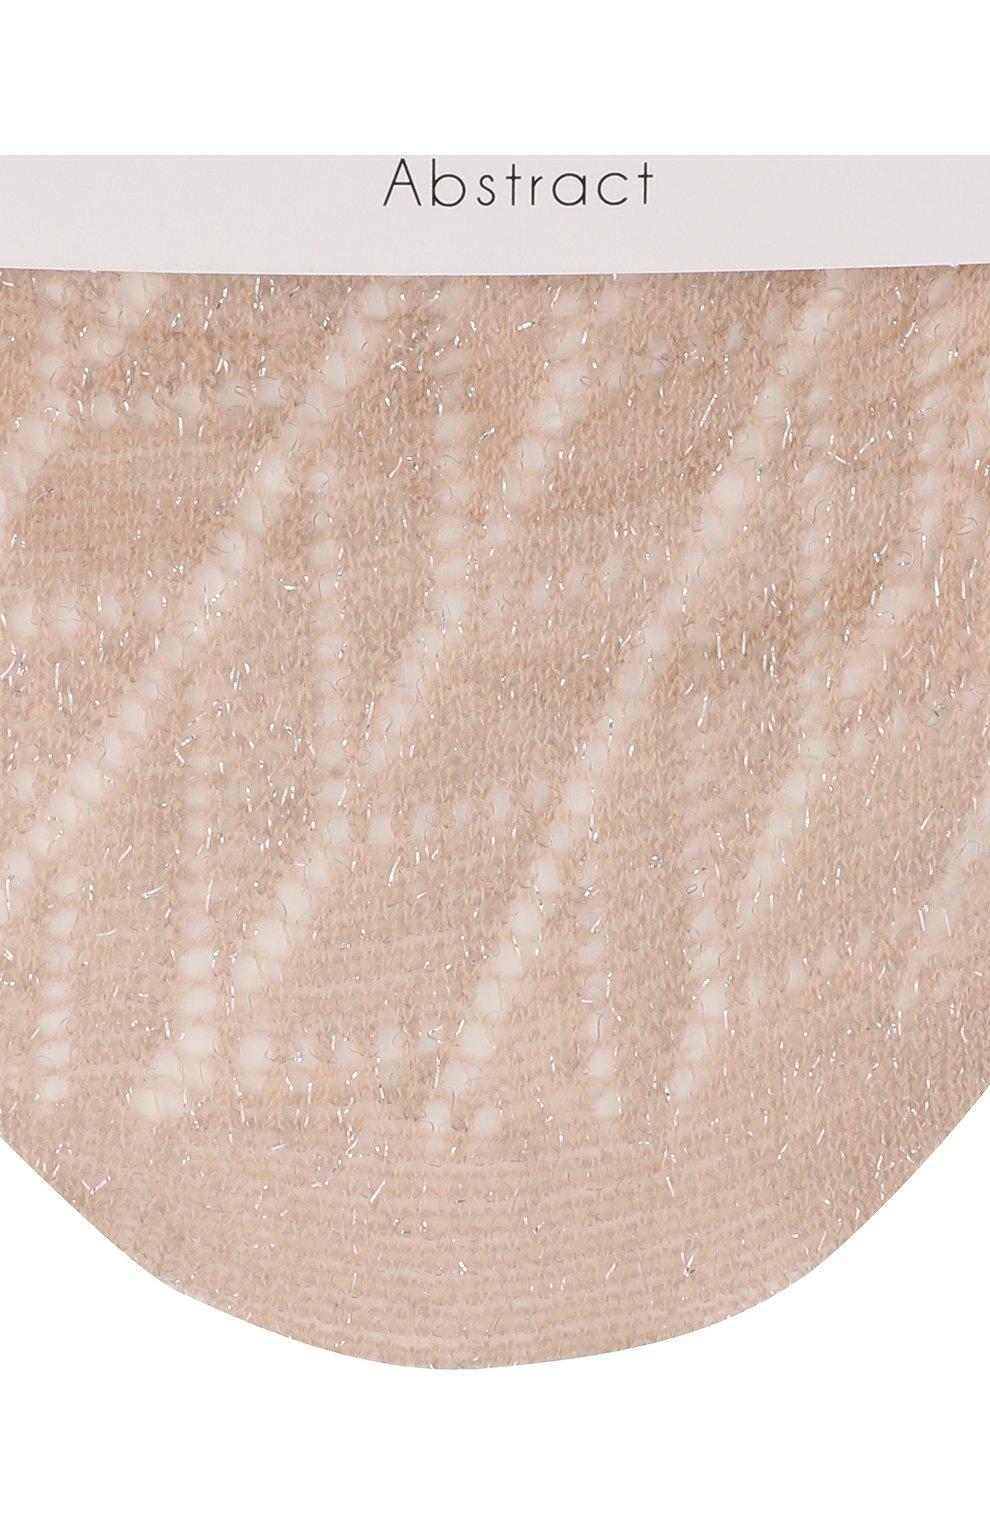 Женские носки abstract OROBLU бежевого цвета, арт. V0BC65878 | Фото 2